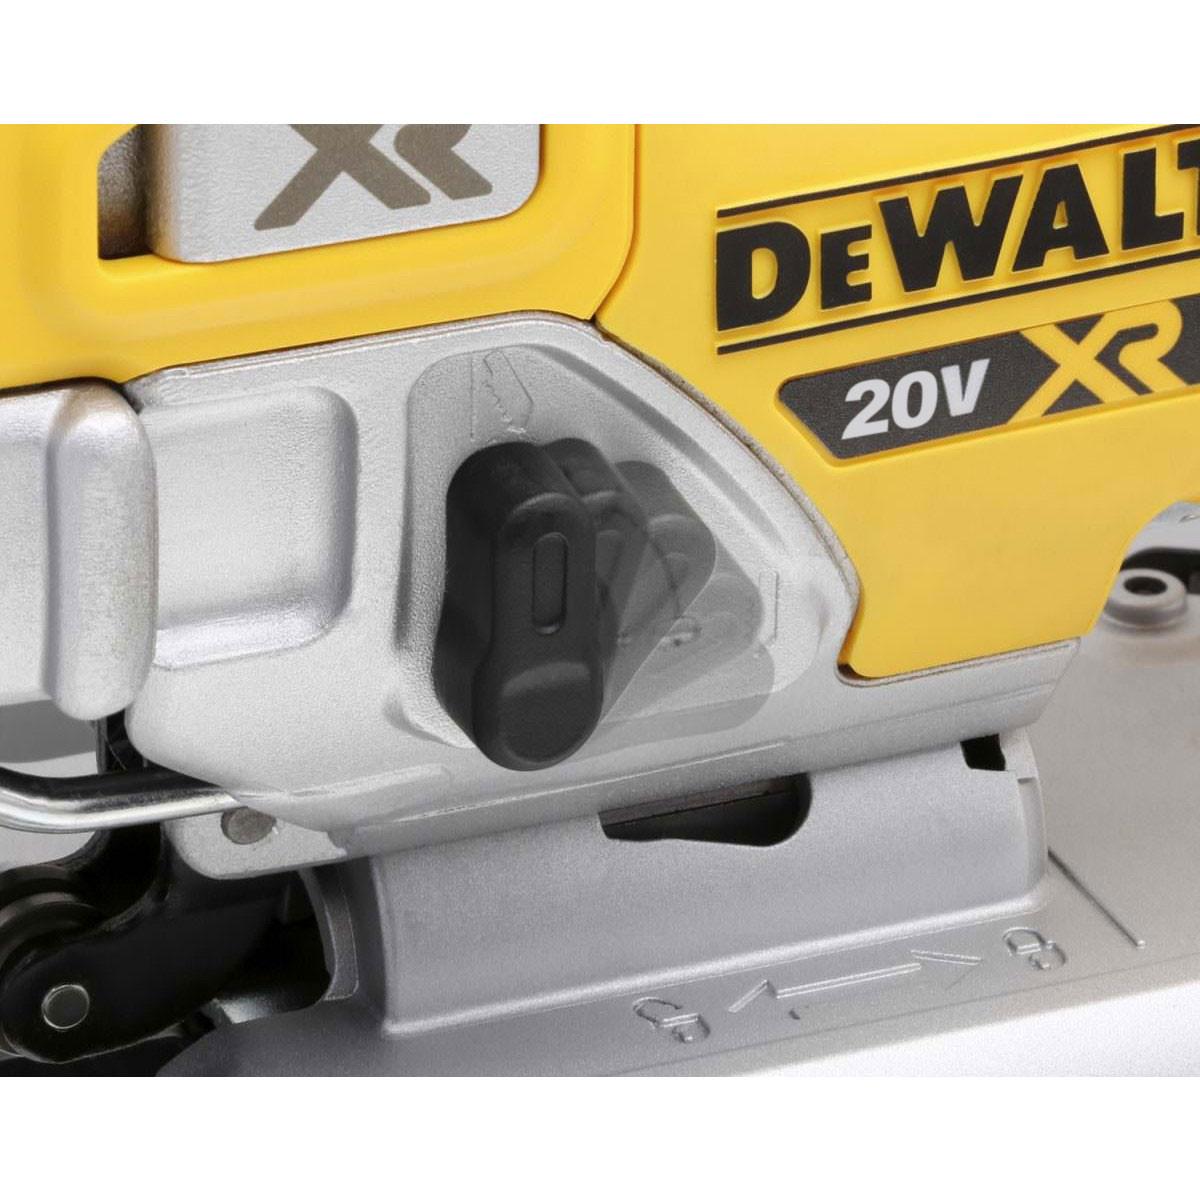 Dewalt DCS334B 20V MAX XR Brushless Cordless Top-Handle Jigsaw Tool Only